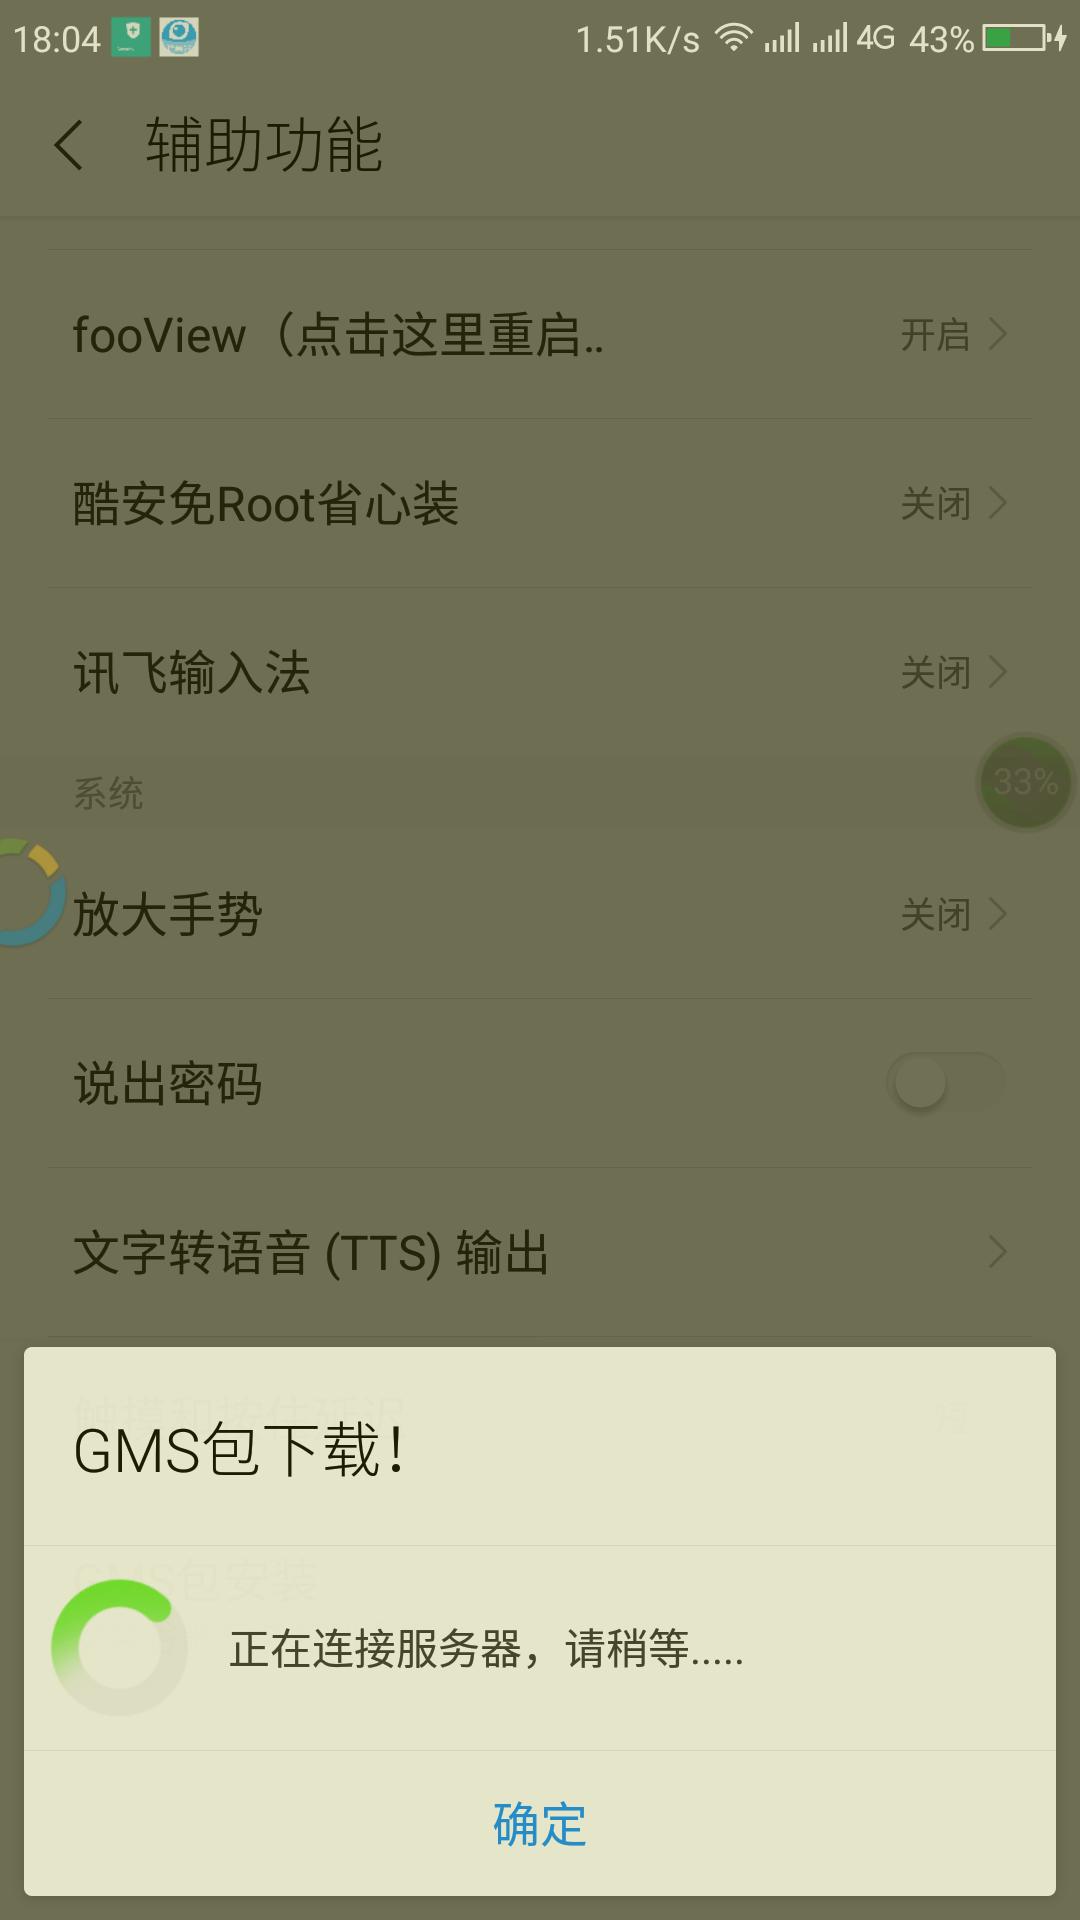 Screenshot_2017-10-16-18-04-09.png